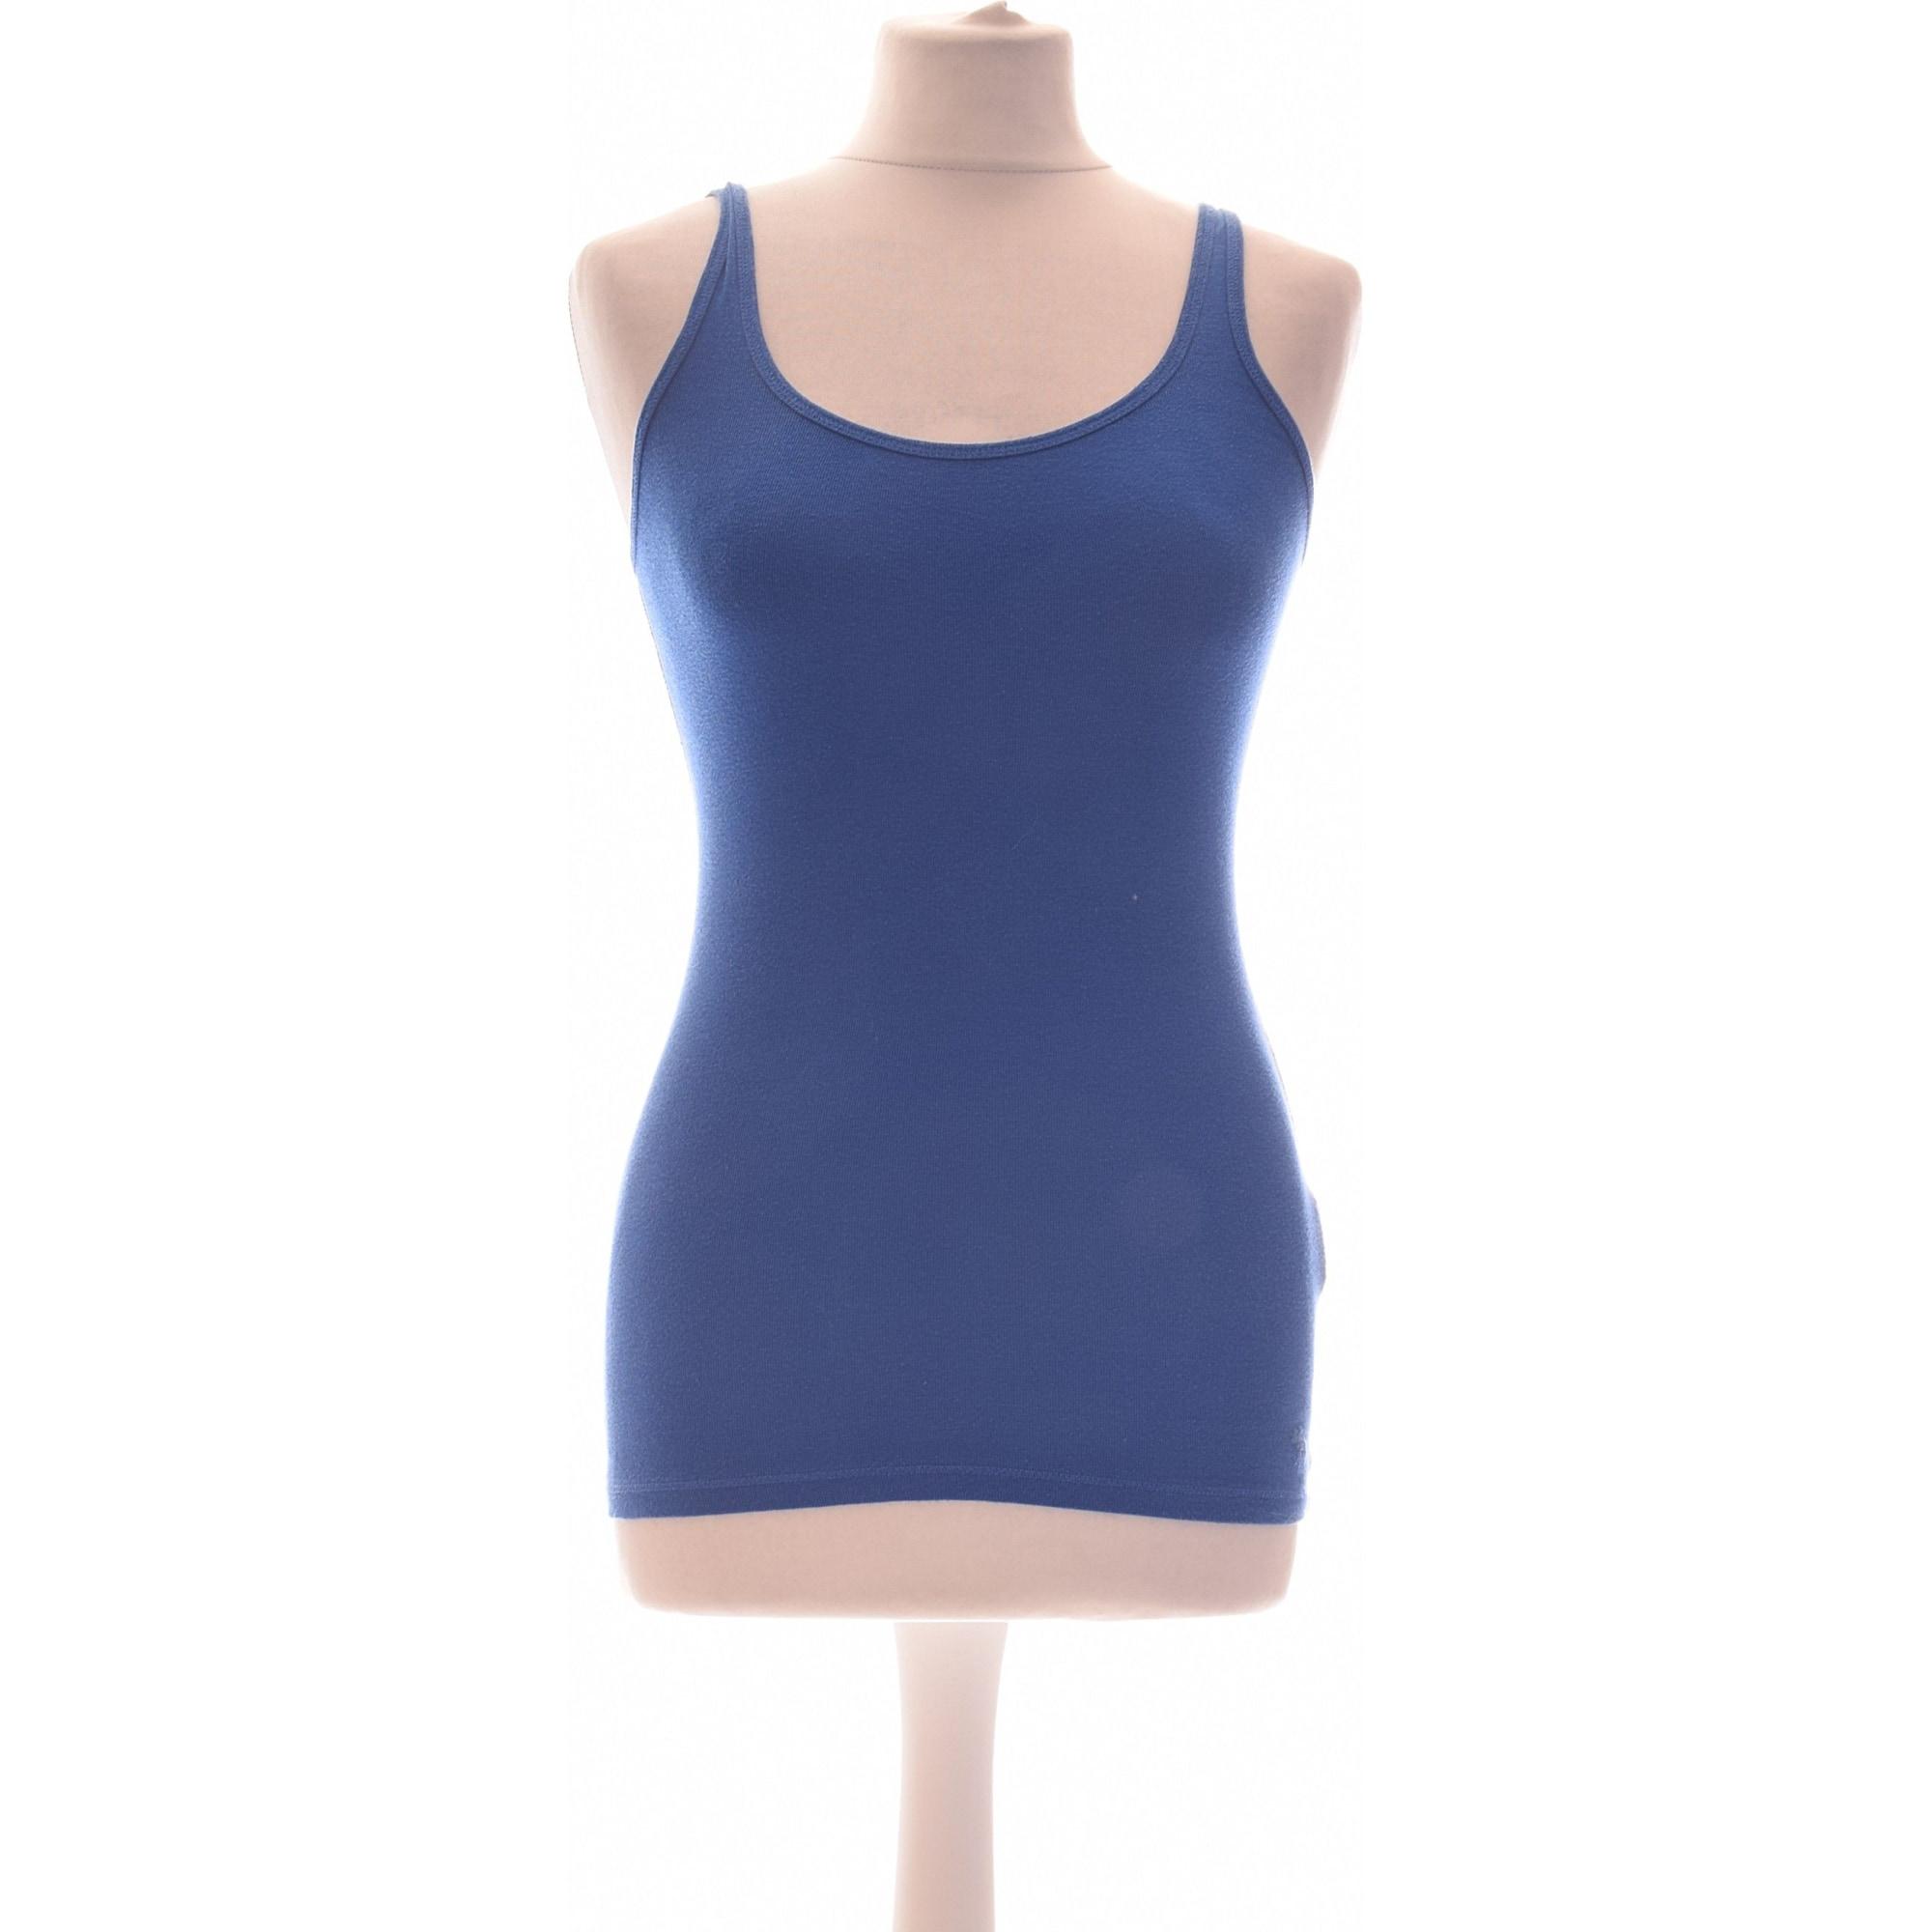 Débardeur ABERCROMBIE & FITCH Bleu, bleu marine, bleu turquoise